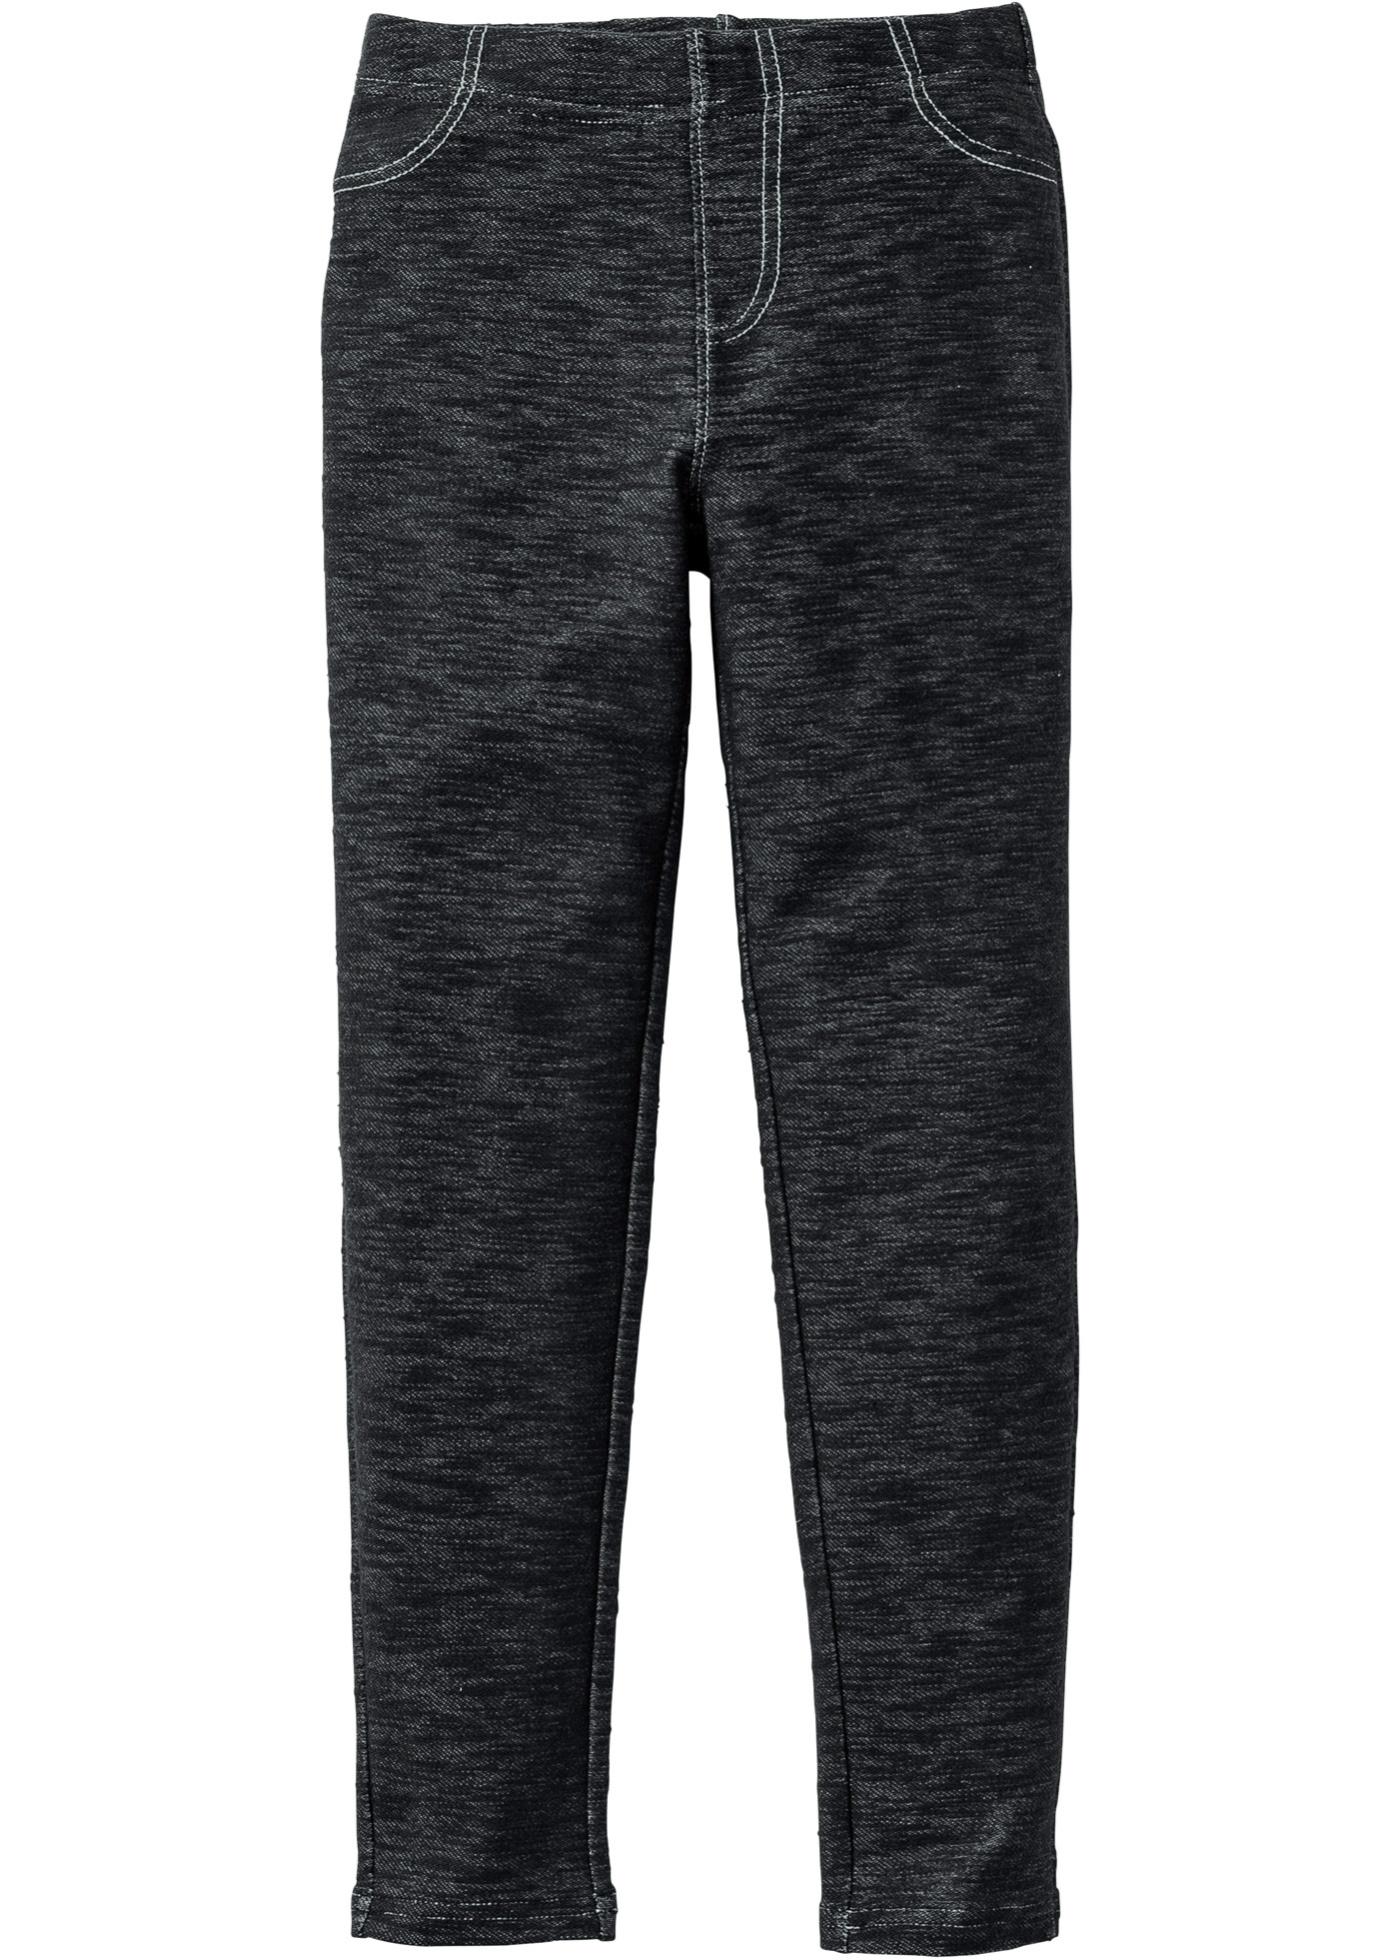 Legging aspect jean